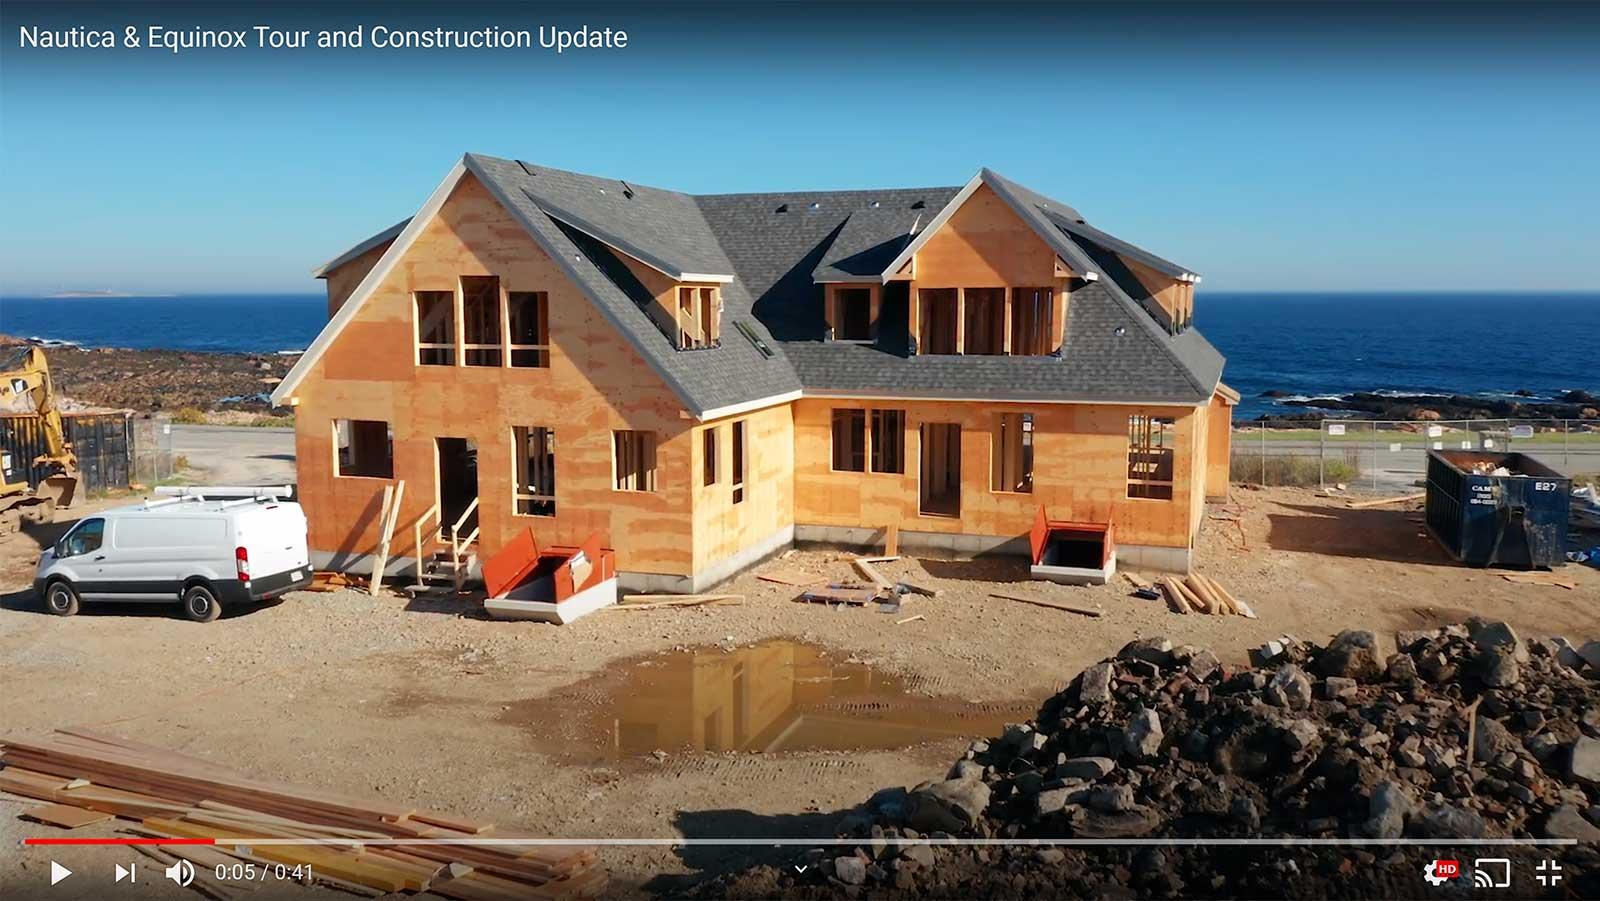 Nautica & Equinox Tour and Construction Update